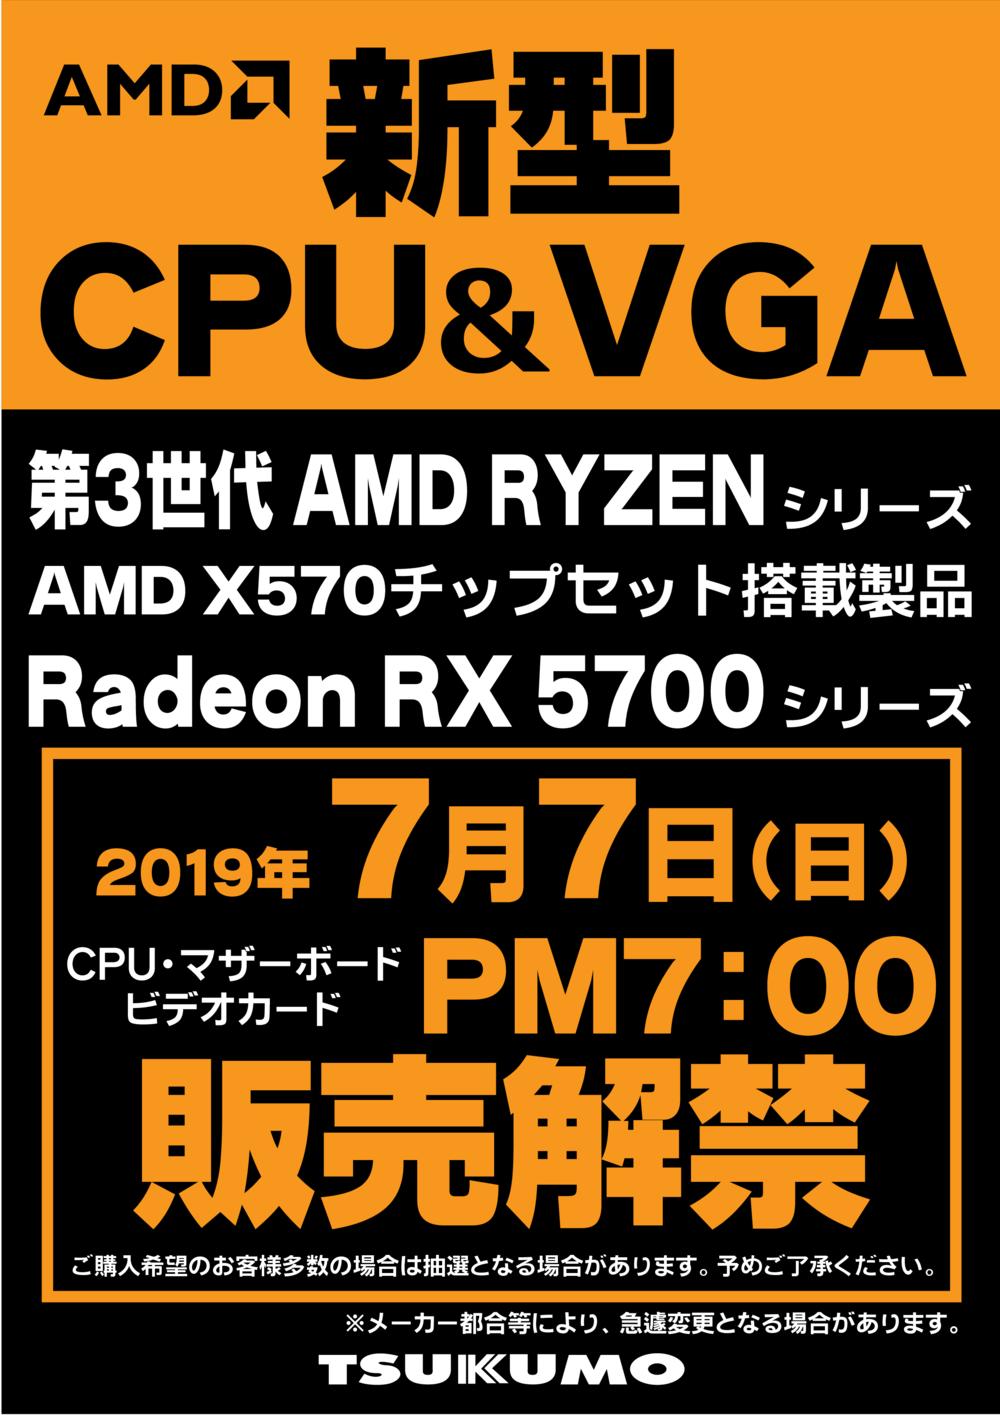 AMD 新APU 第3世代RYZEN 発売 福岡.png